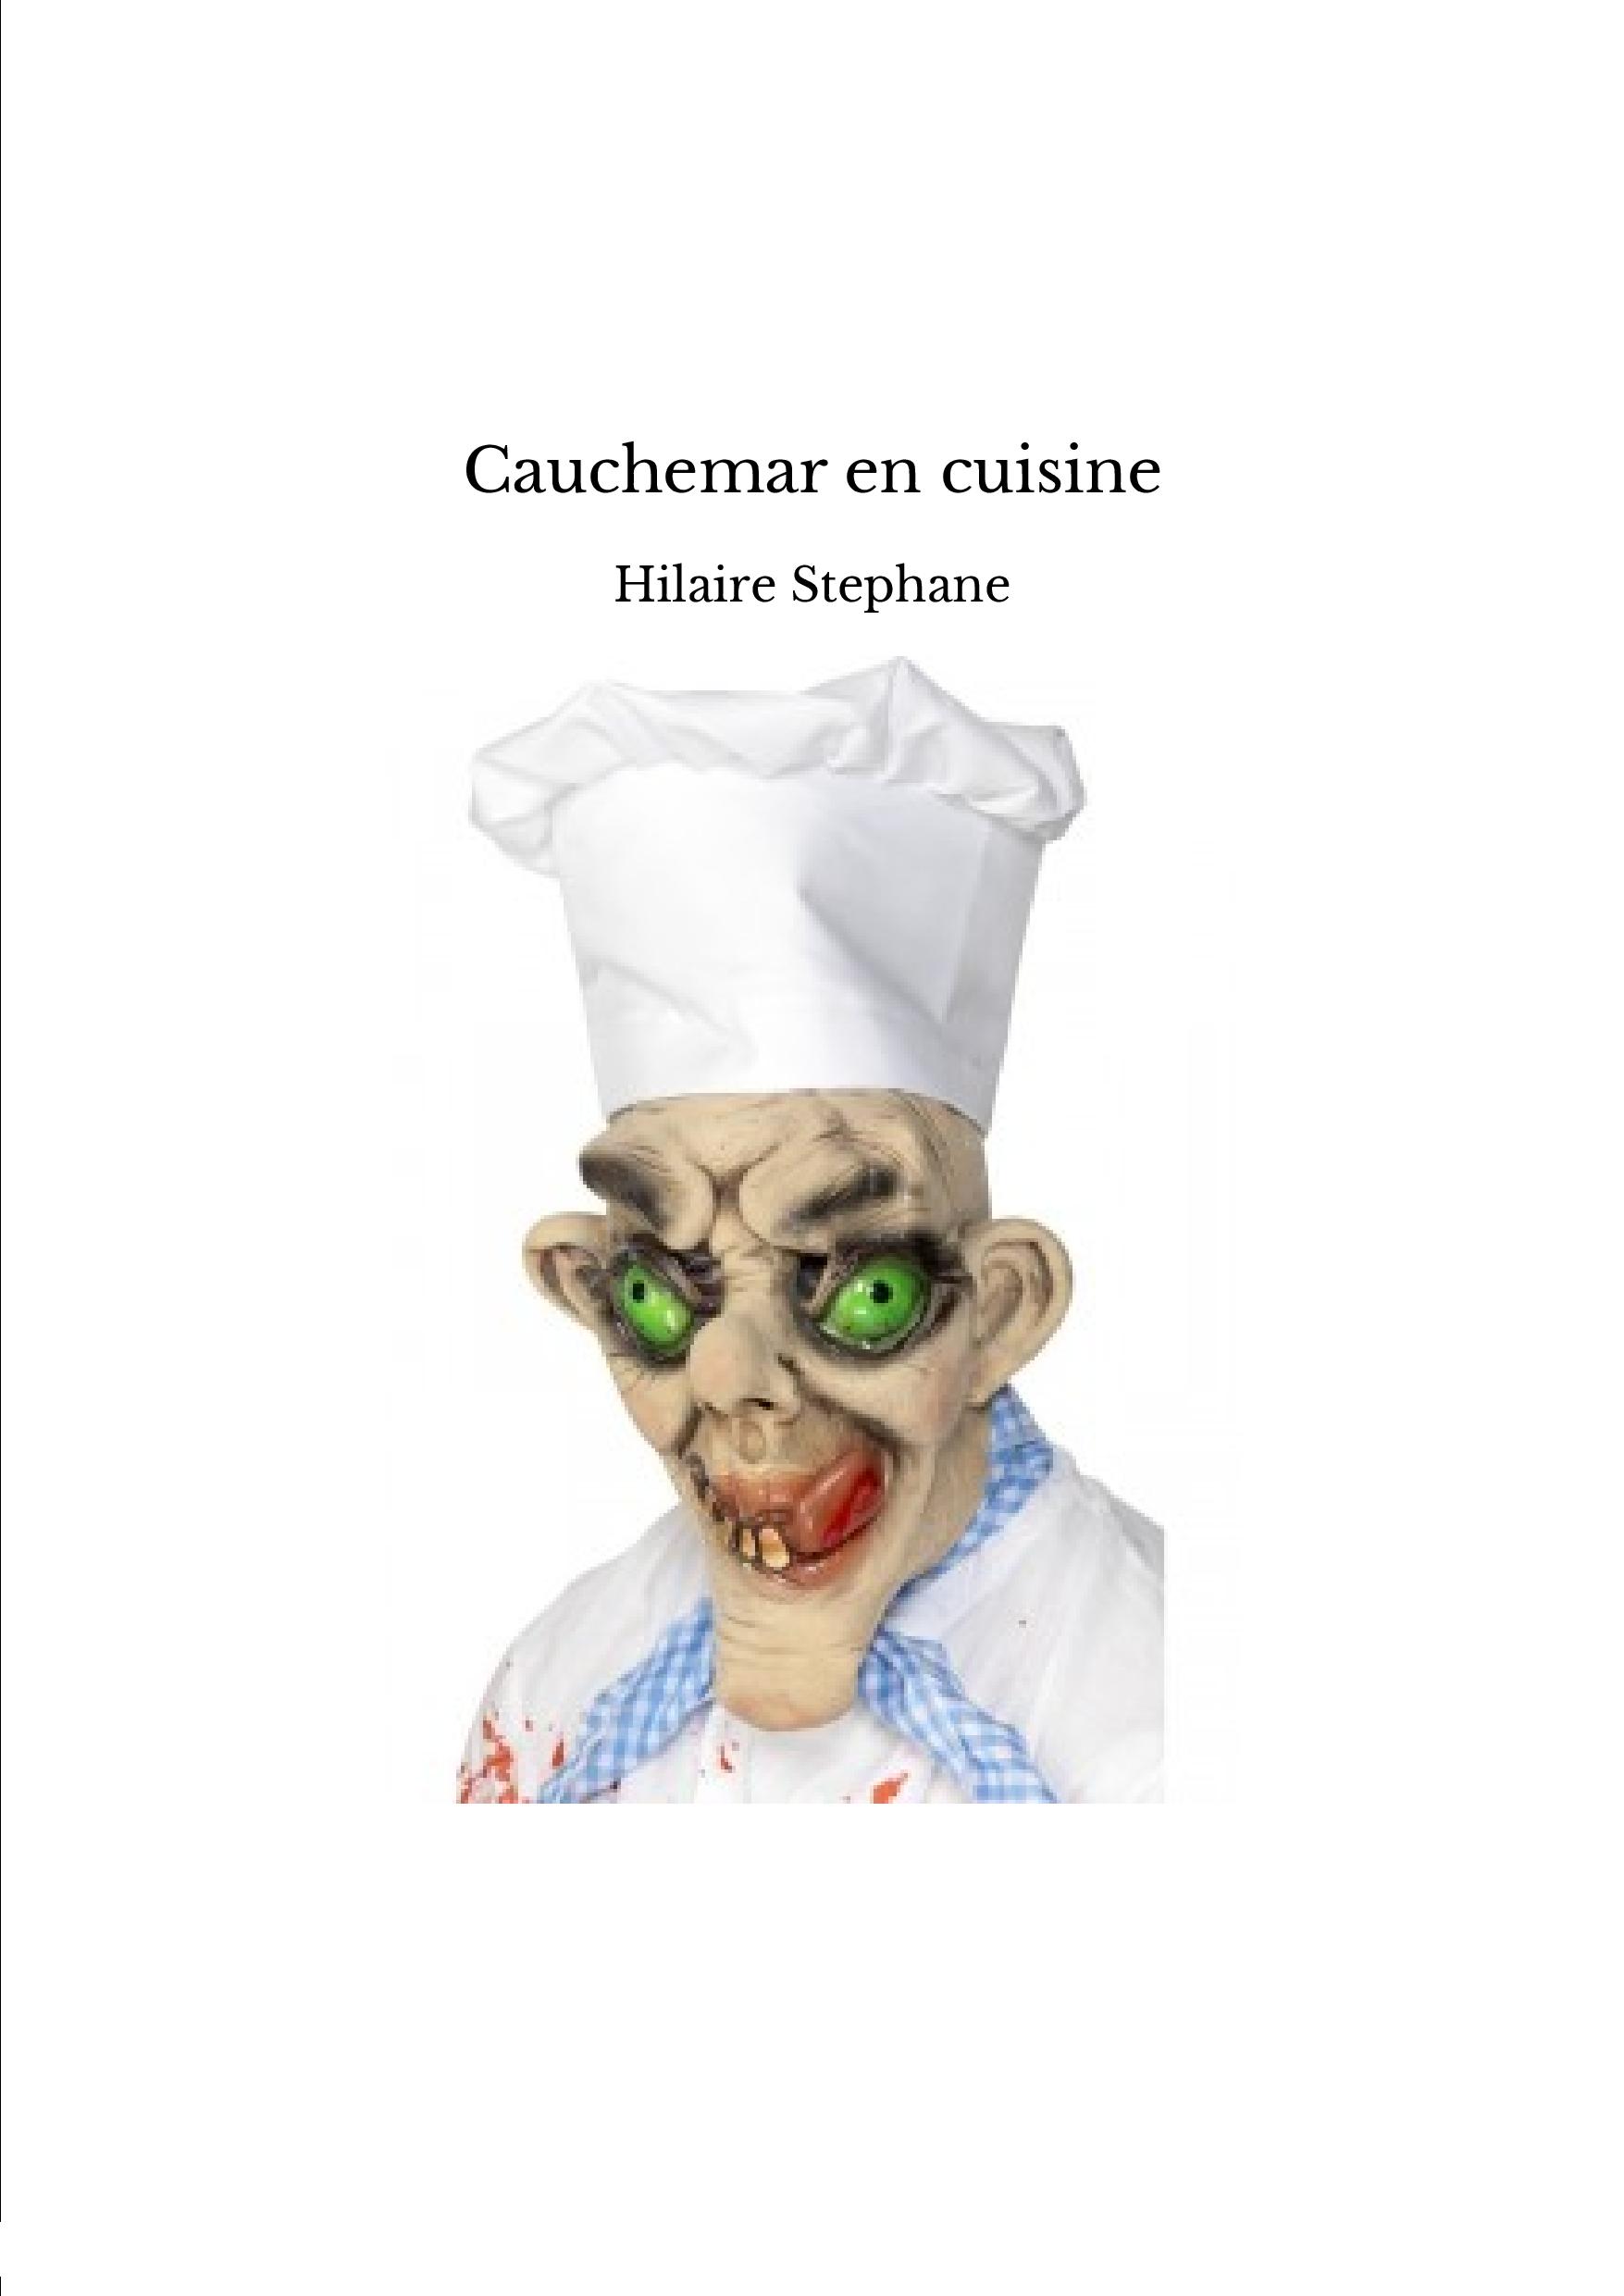 Cauchemar en cuisine